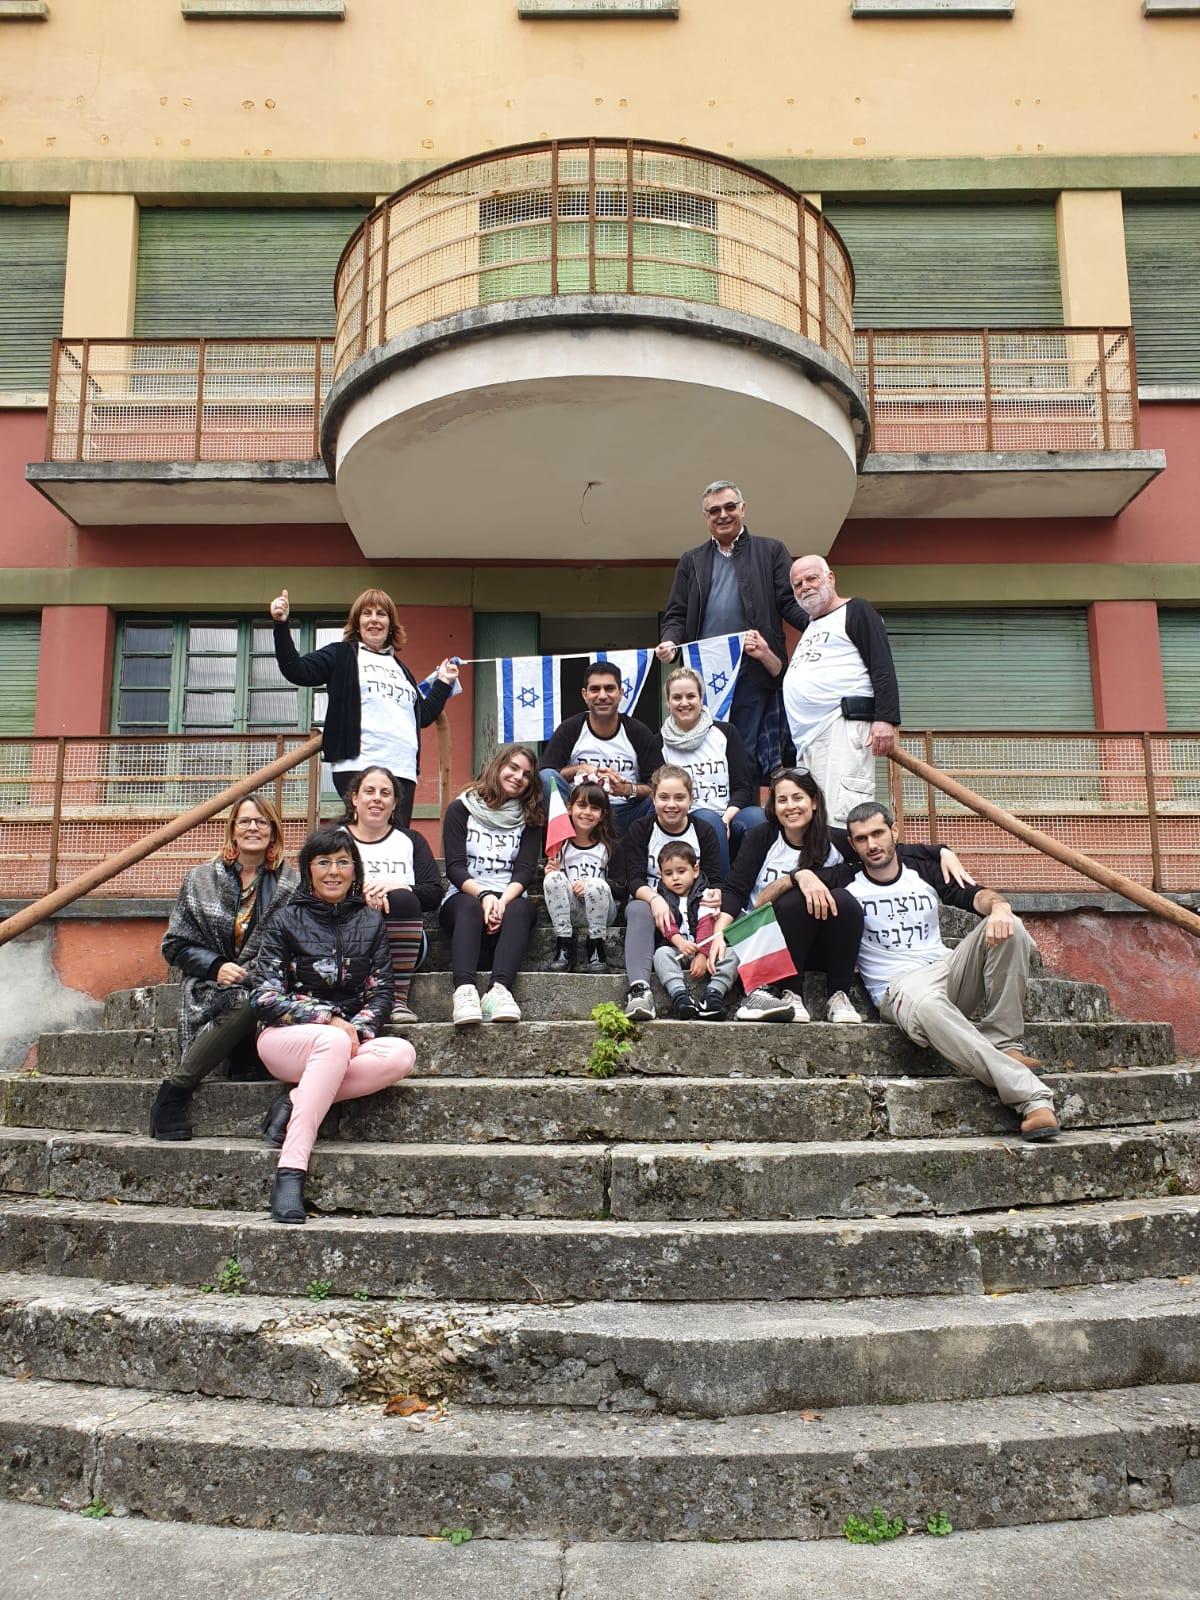 2019-10-18-Visita-famiglia-Rivka-Krol-11